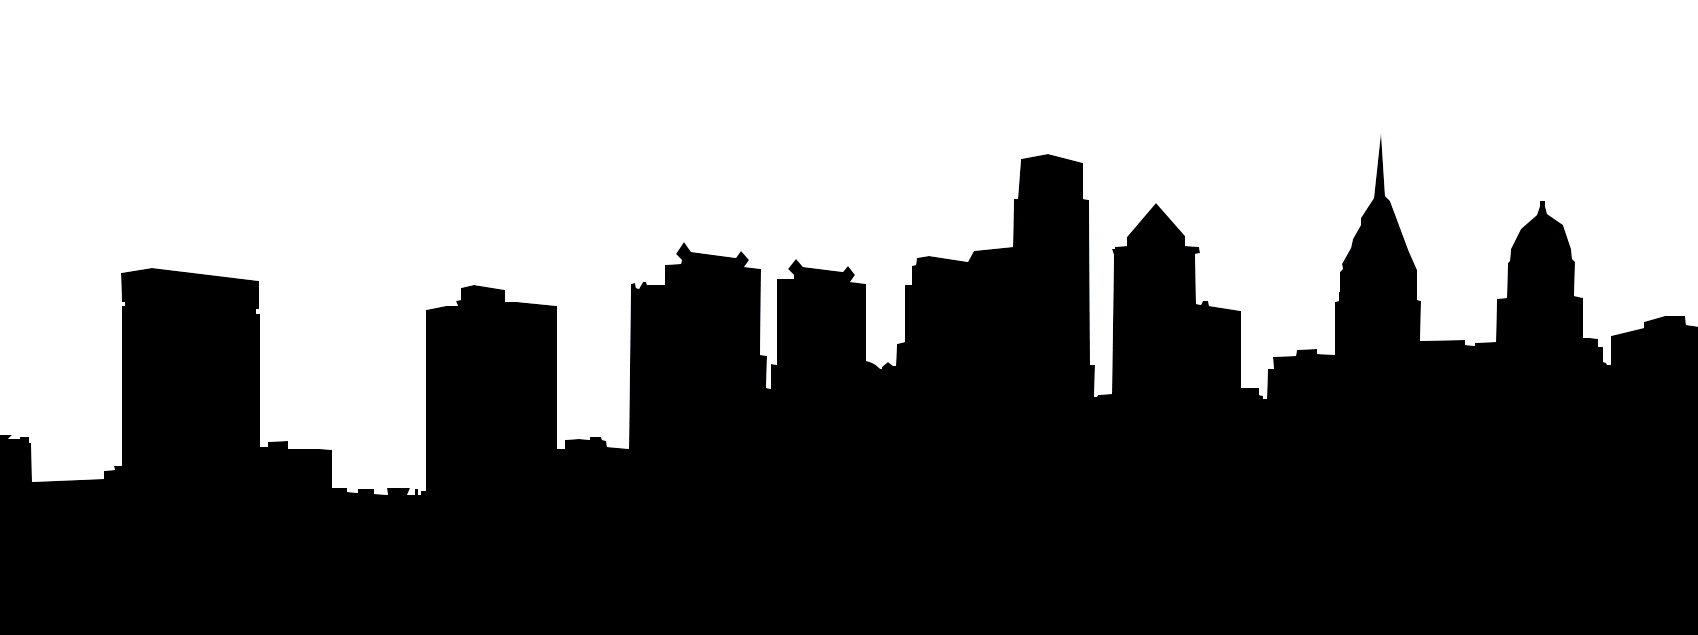 1698x635 Houston Skyline Outline